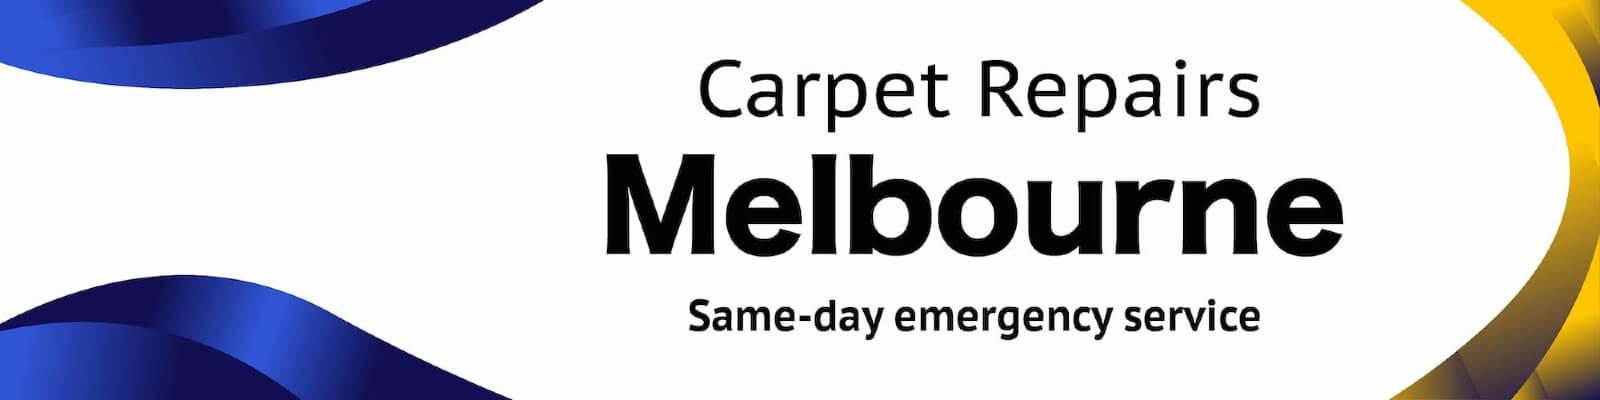 Magic Carpet Repairs Melbourne Banner